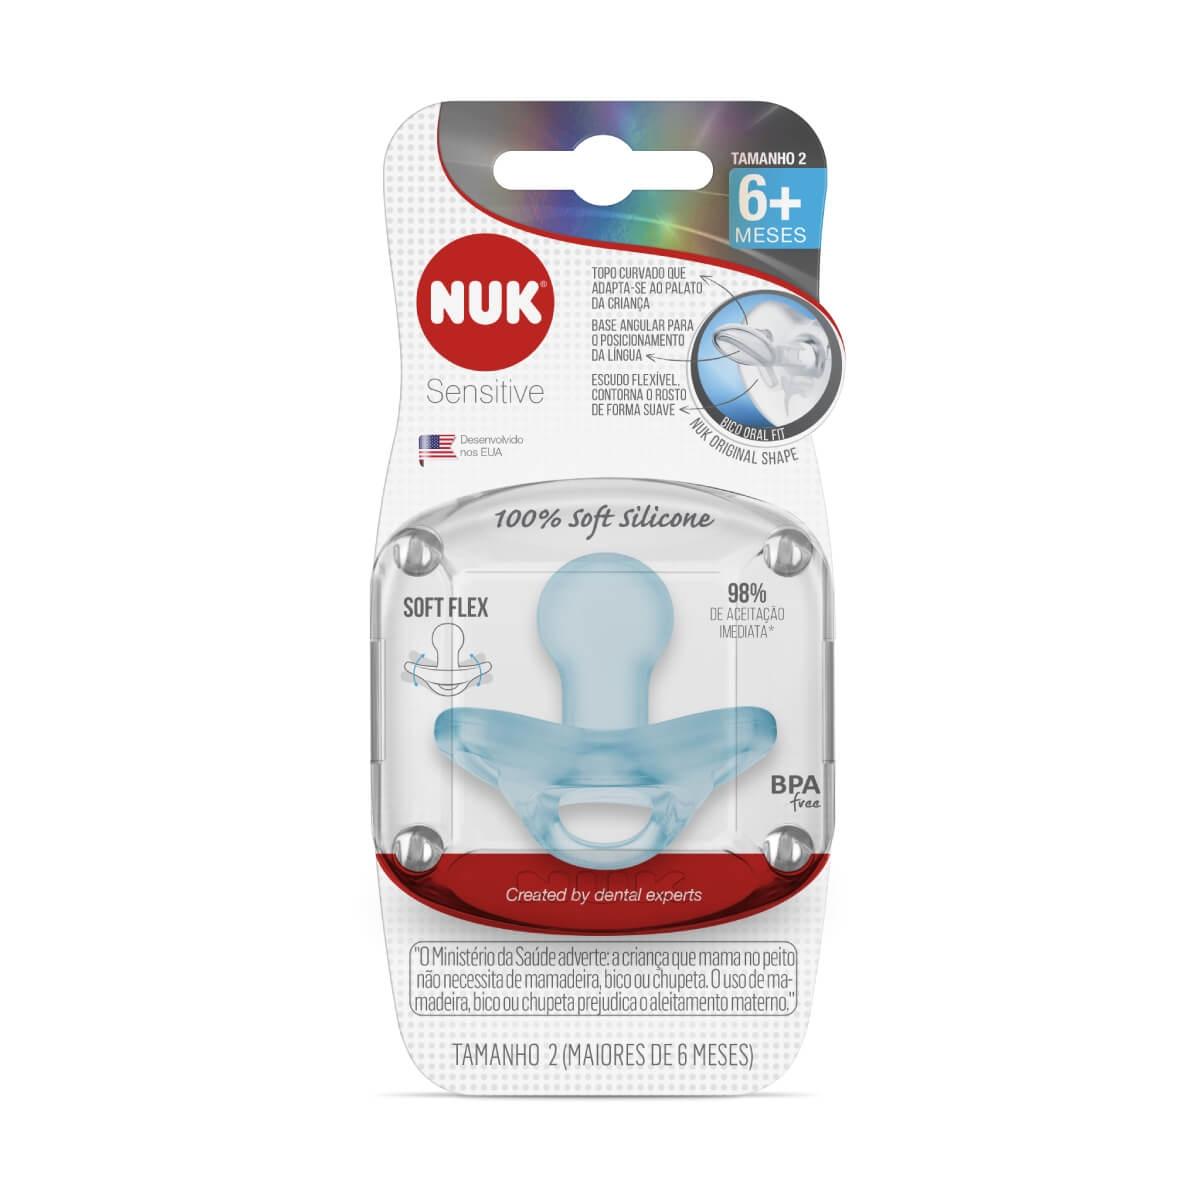 Chupeta Nuk Sensitive 100% Soft Silicone Tamanho 2 Azul 1 Unidade